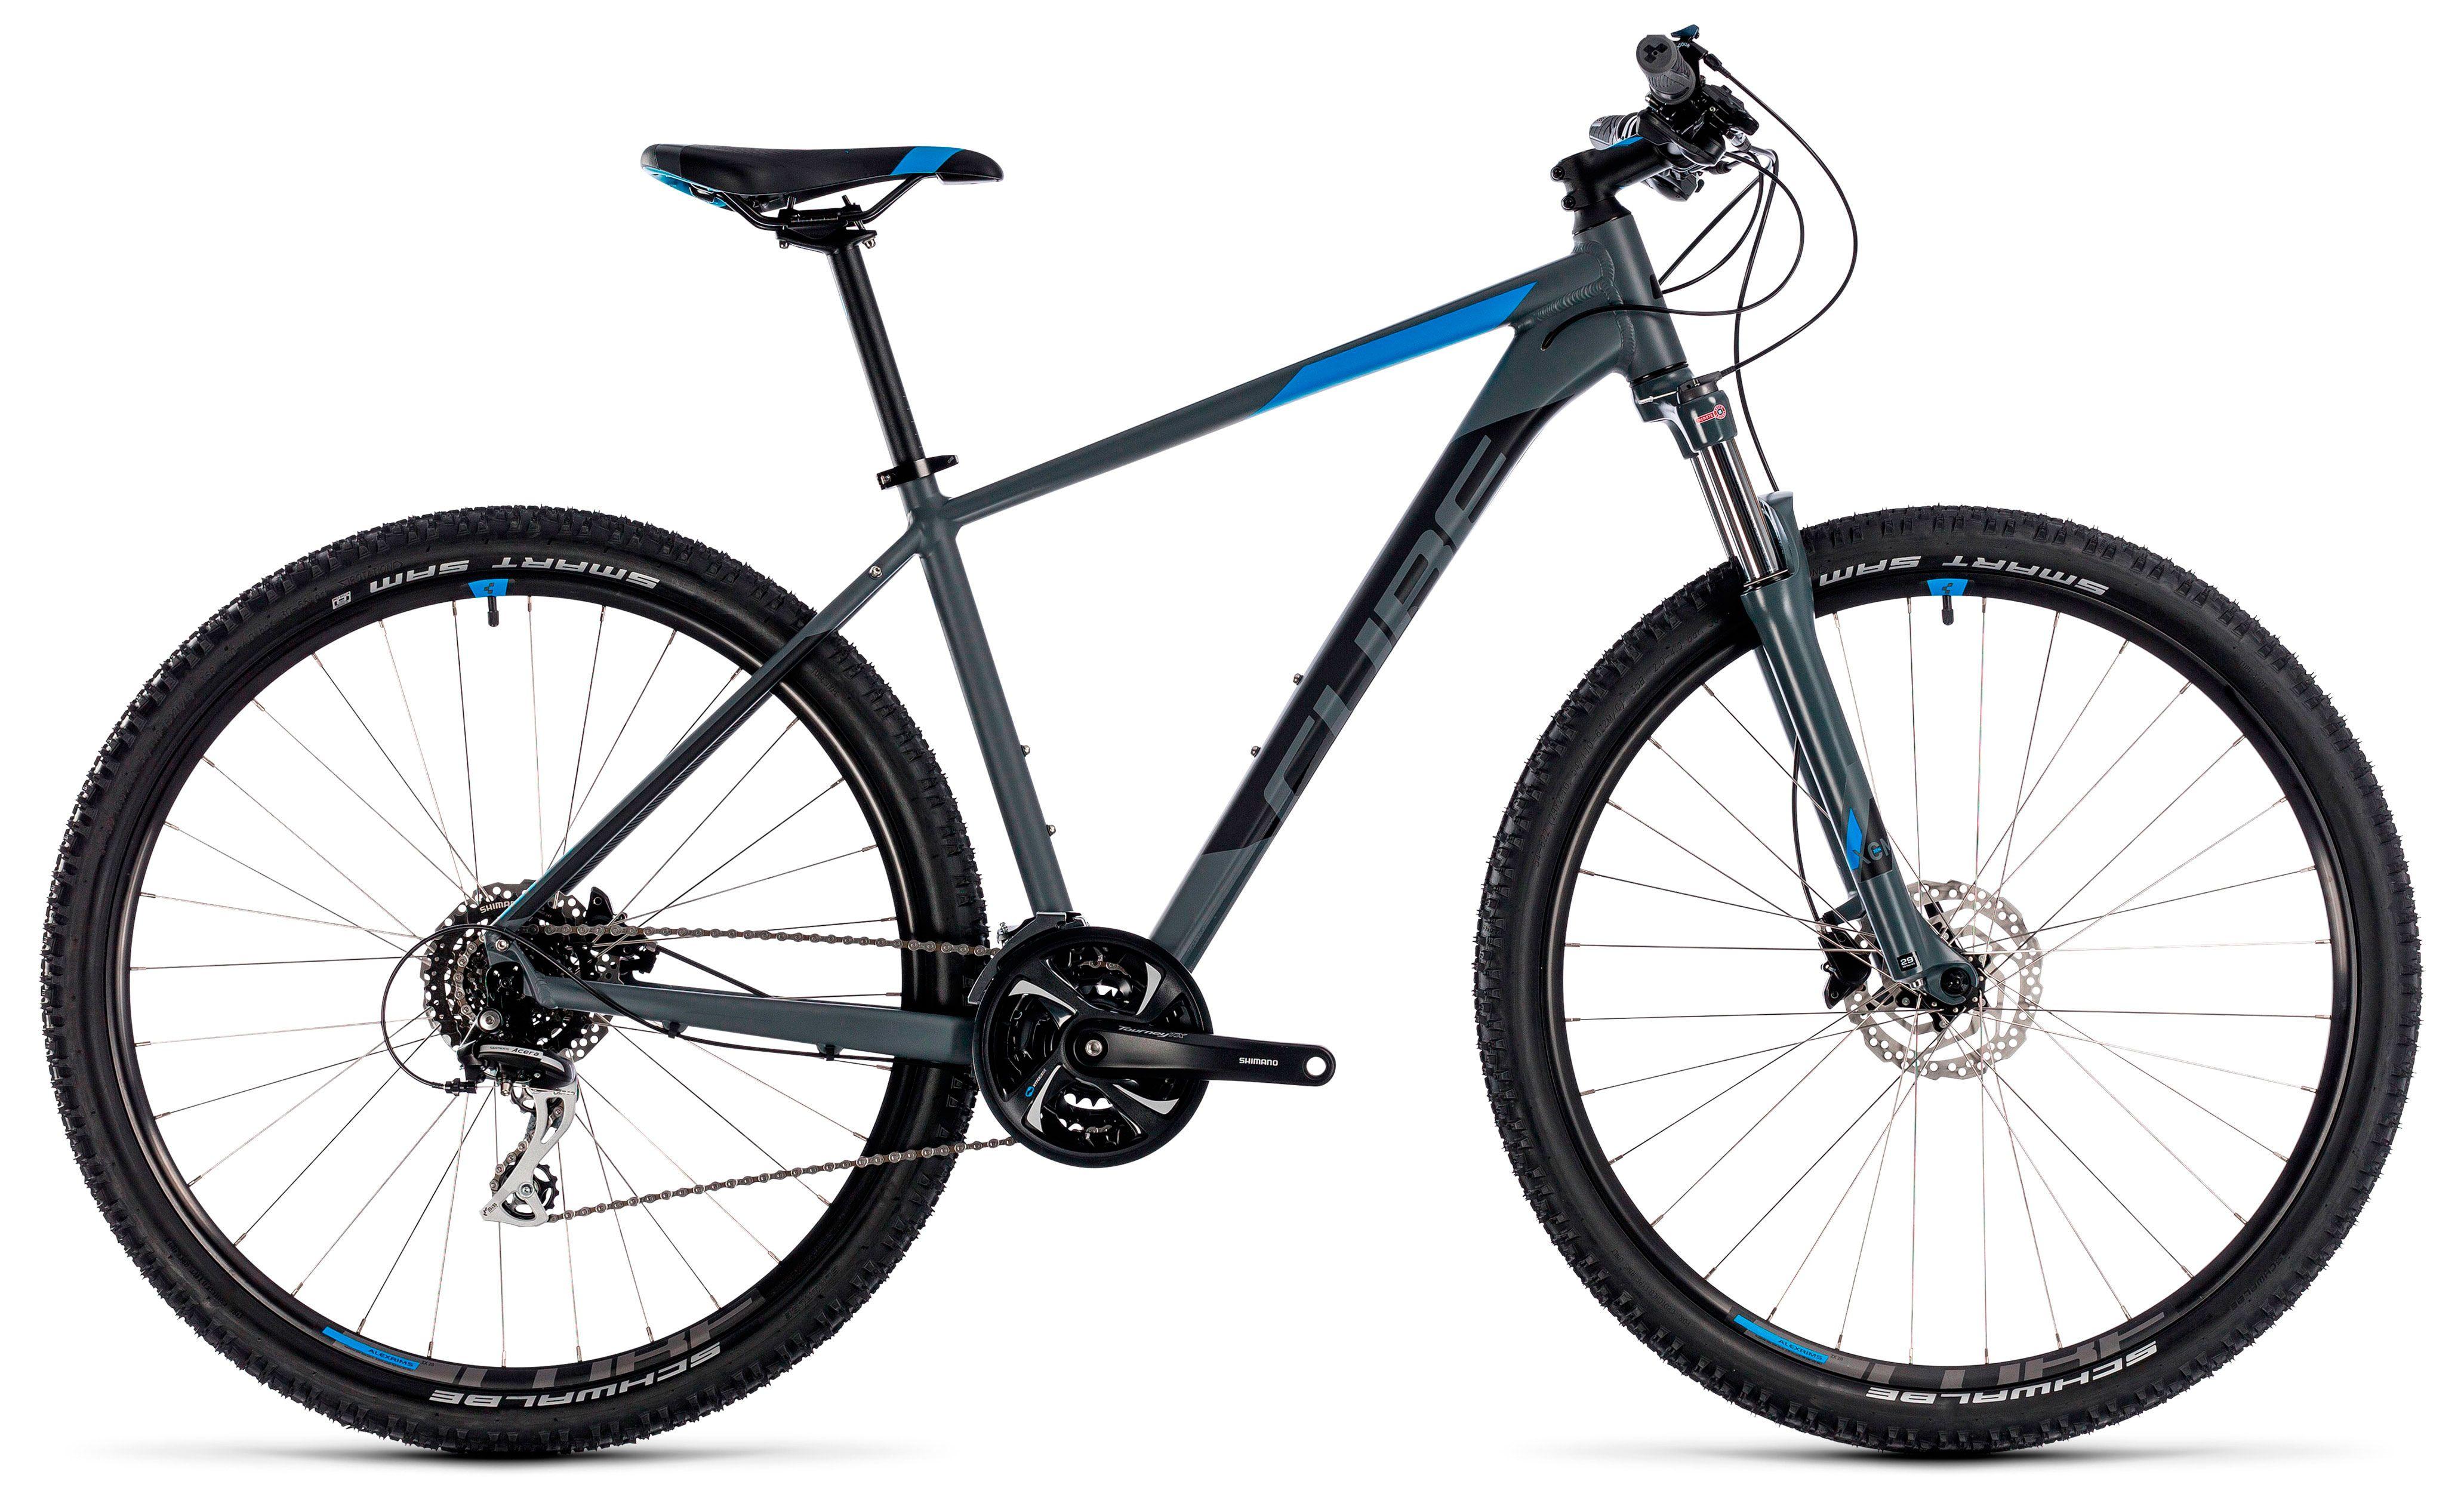 Велосипед Cube AIM Race 27,5 2018 велосипед cube tonopah race lady 2013